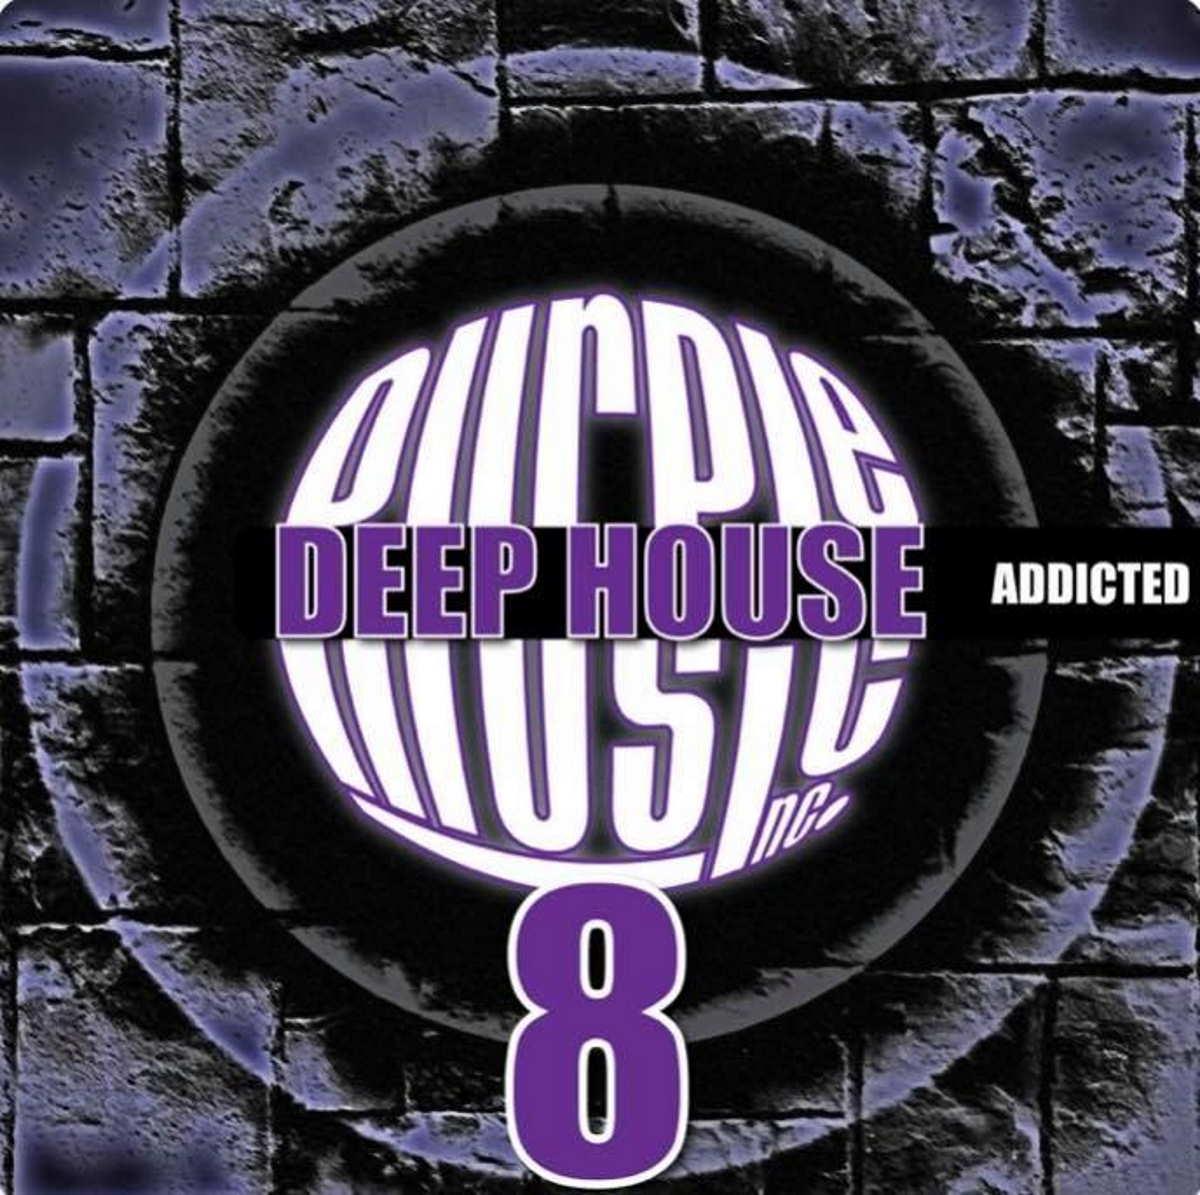 Modus Dj, Come and Go with Me dentro Deep House Addicted 8 (Purple Music) nella versione di Jamie Lewis